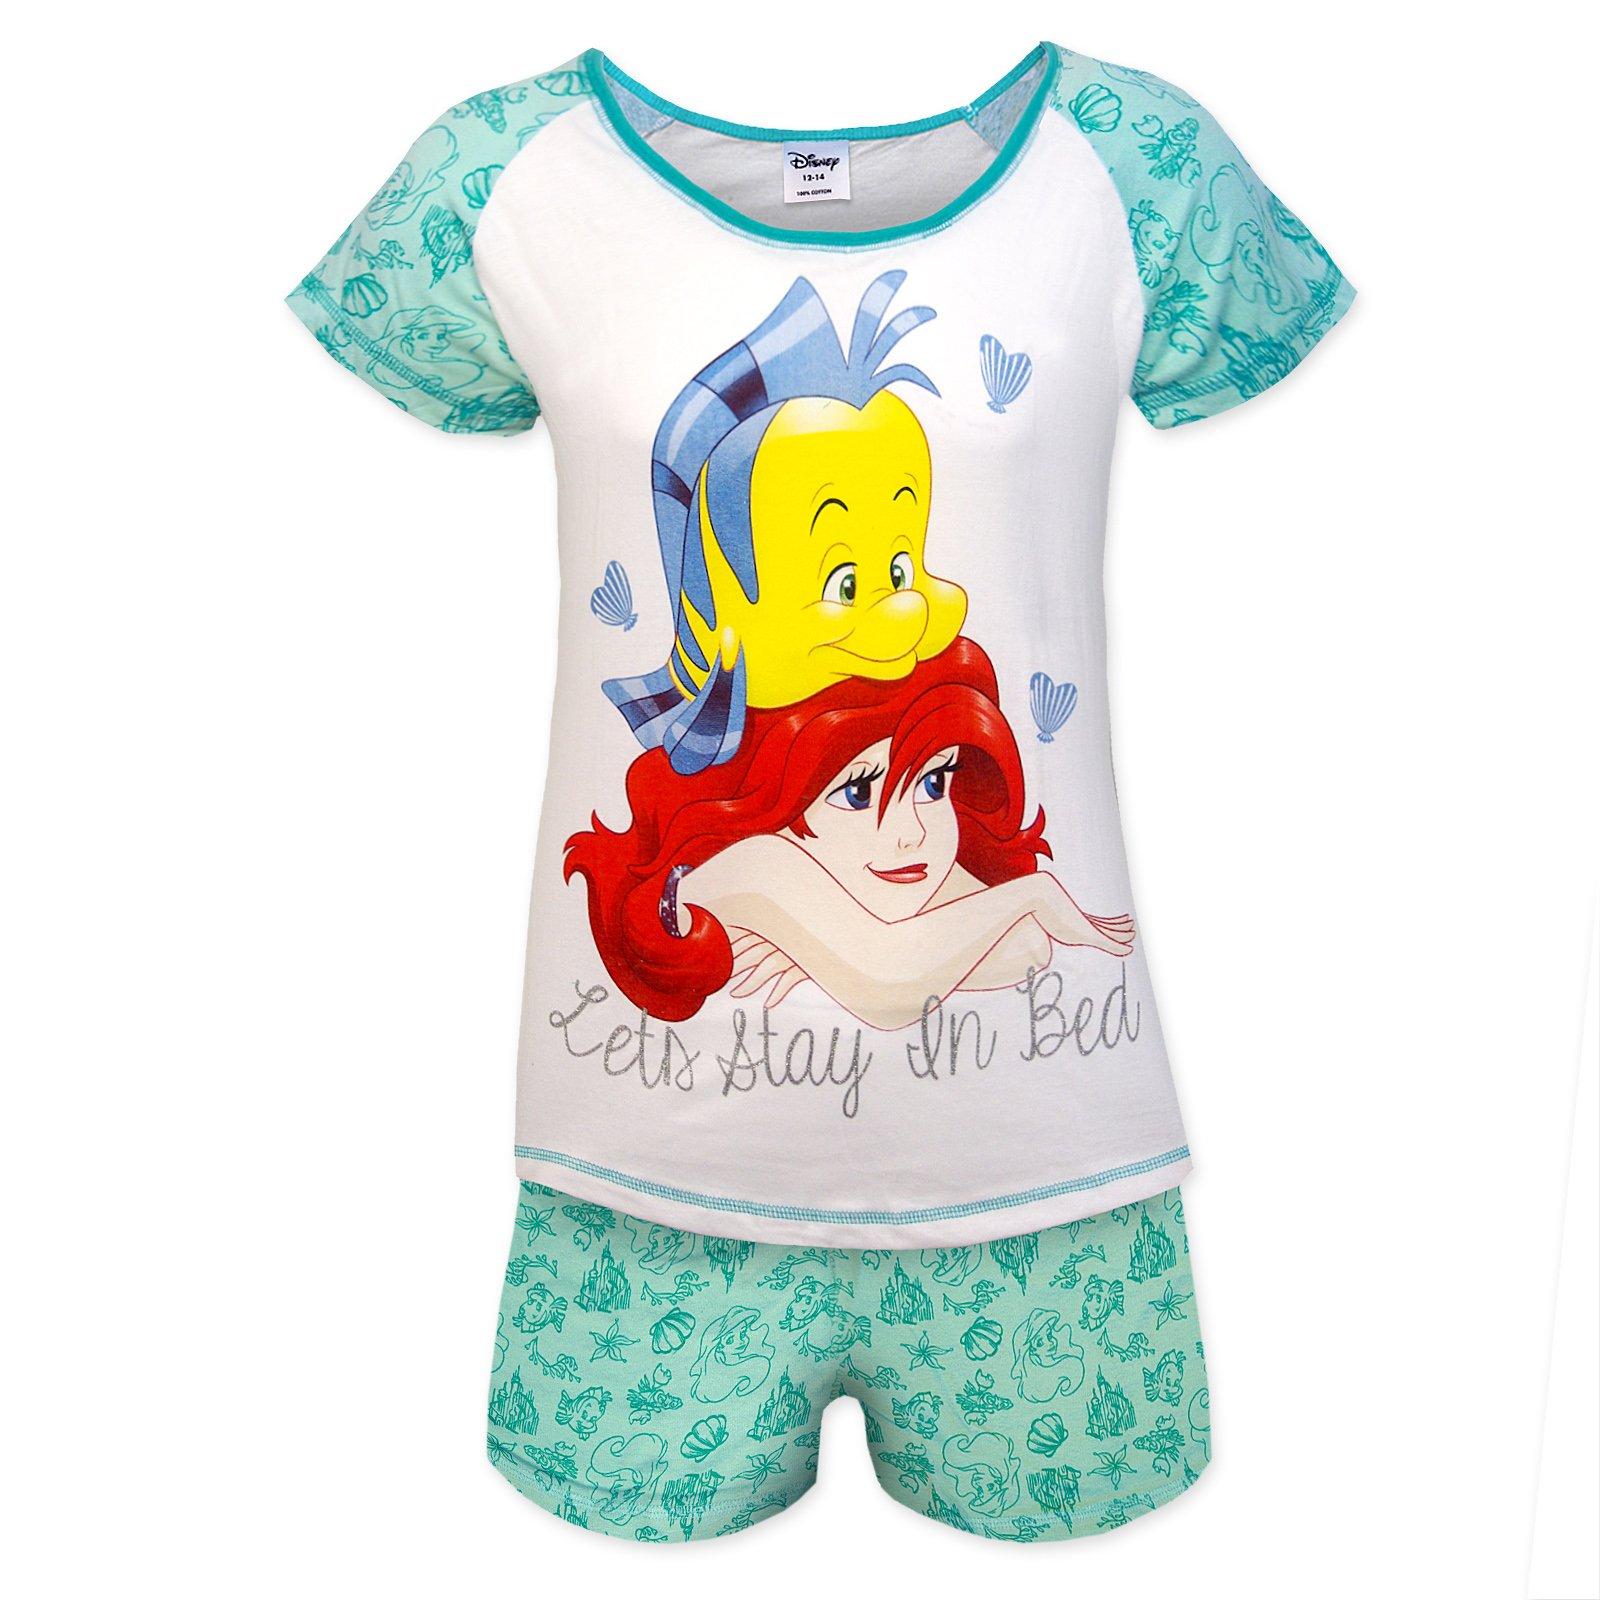 Disney Little Mermaid Official Gift Ladies Short Pajamas Green Size 16-18